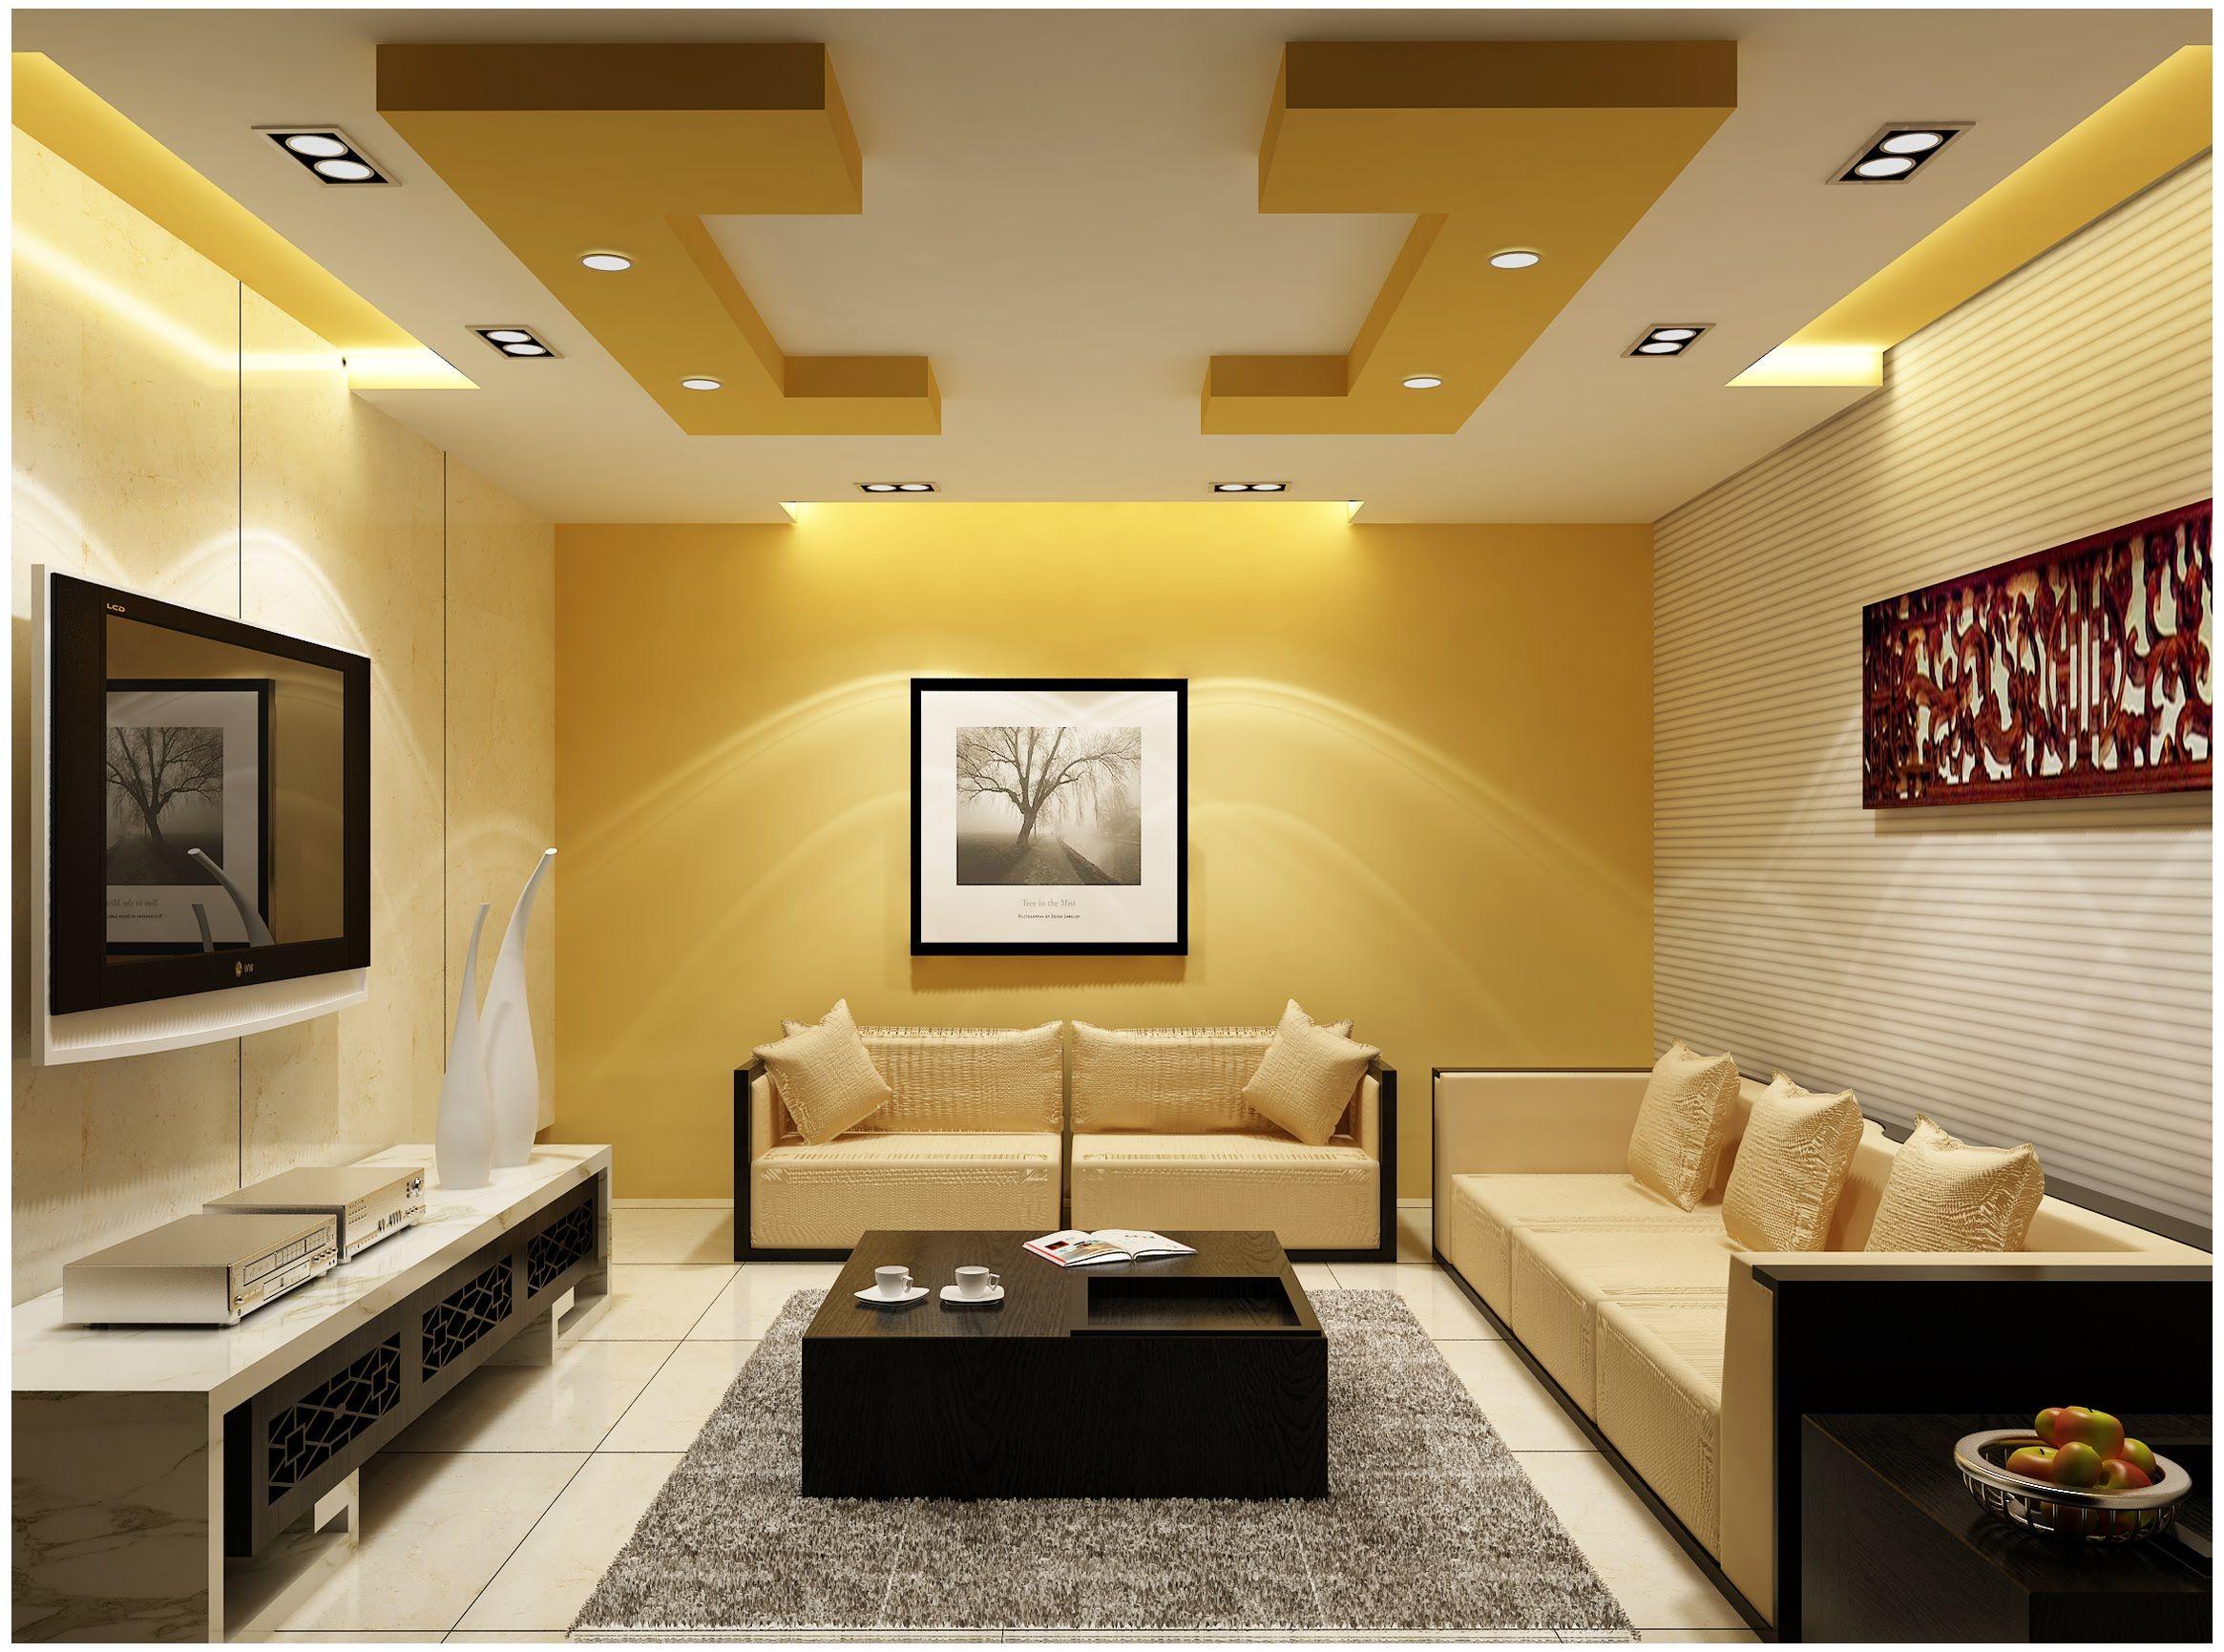 Interior Design For Hall Fall Ceiling